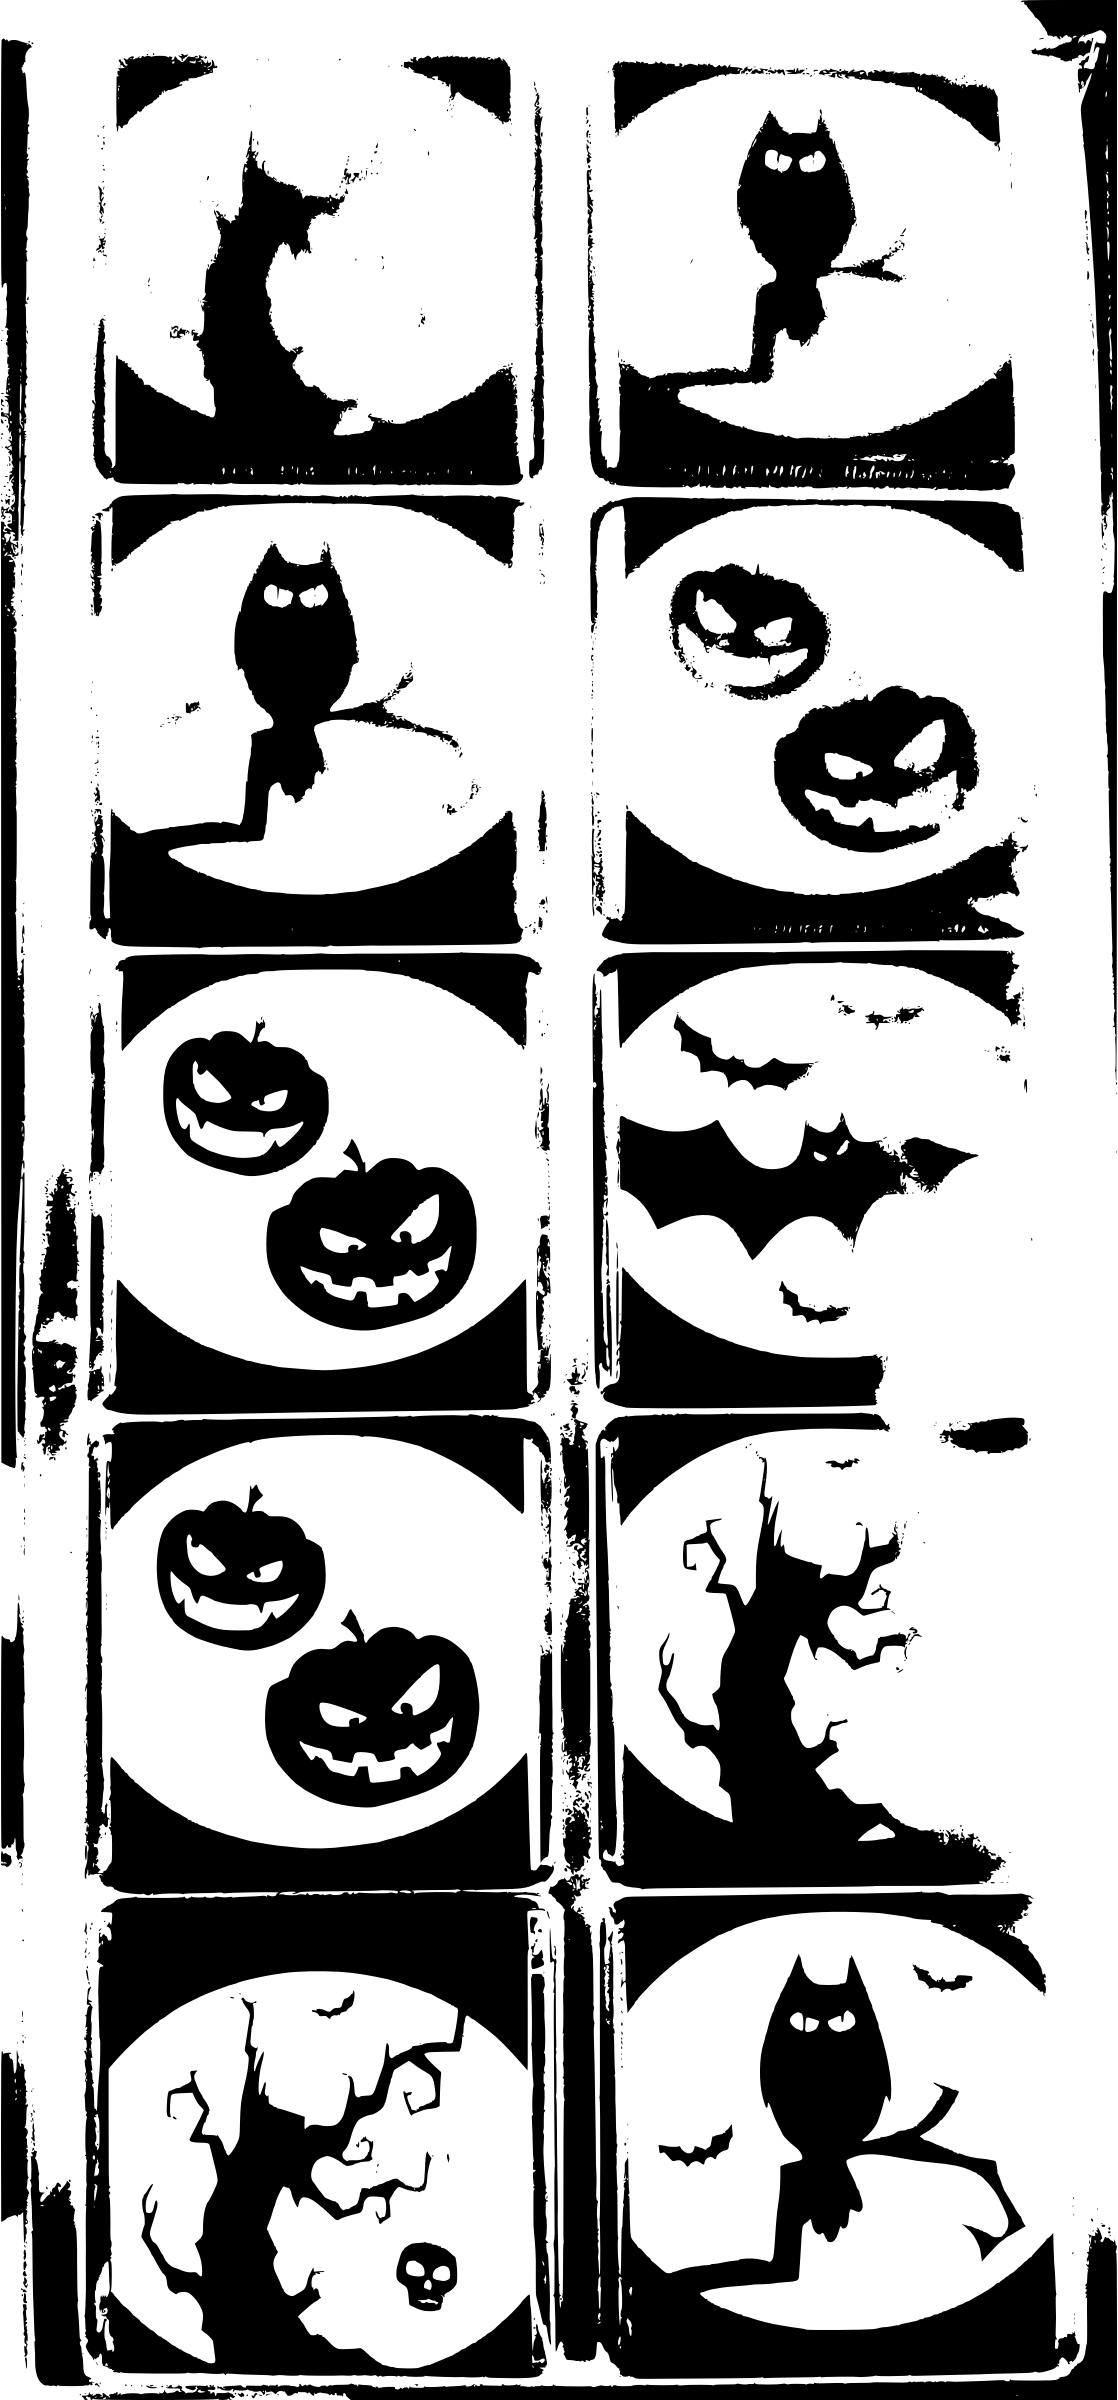 Clipart halloween symbol. Request help extract symbols